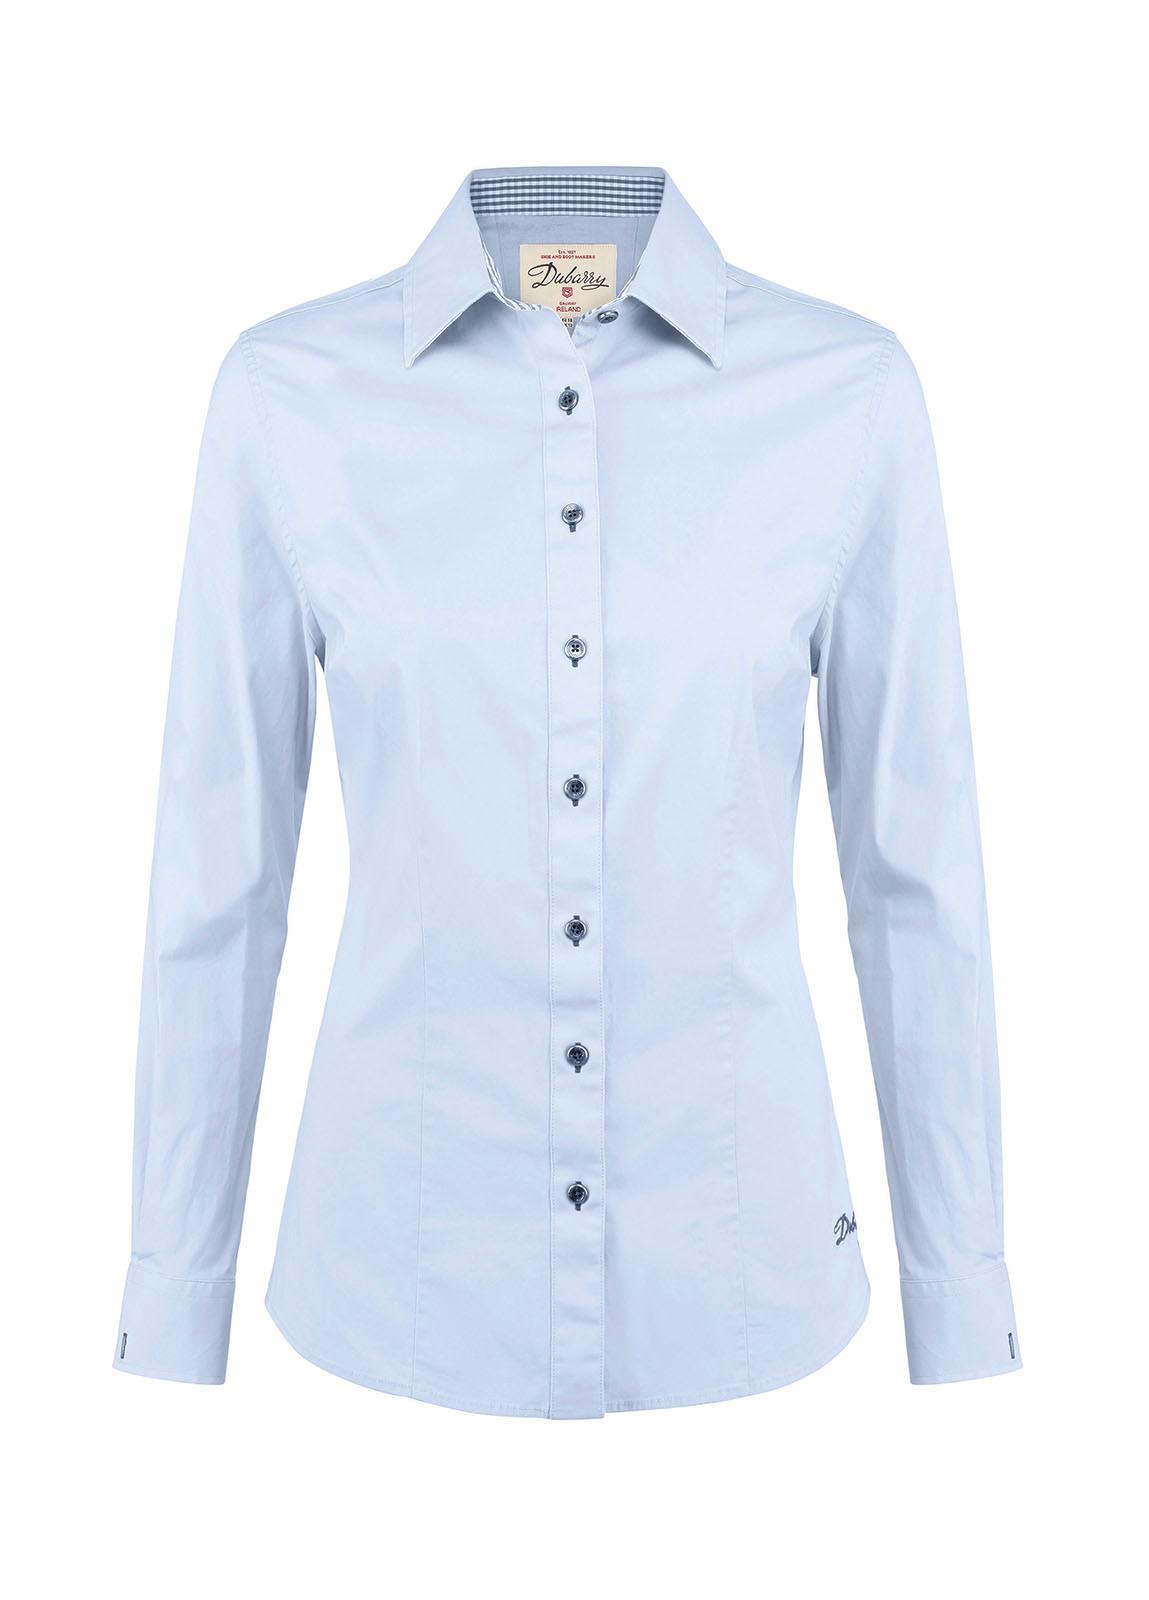 Dubarry_ Carnation Womens Shirt - Blue_Image_2